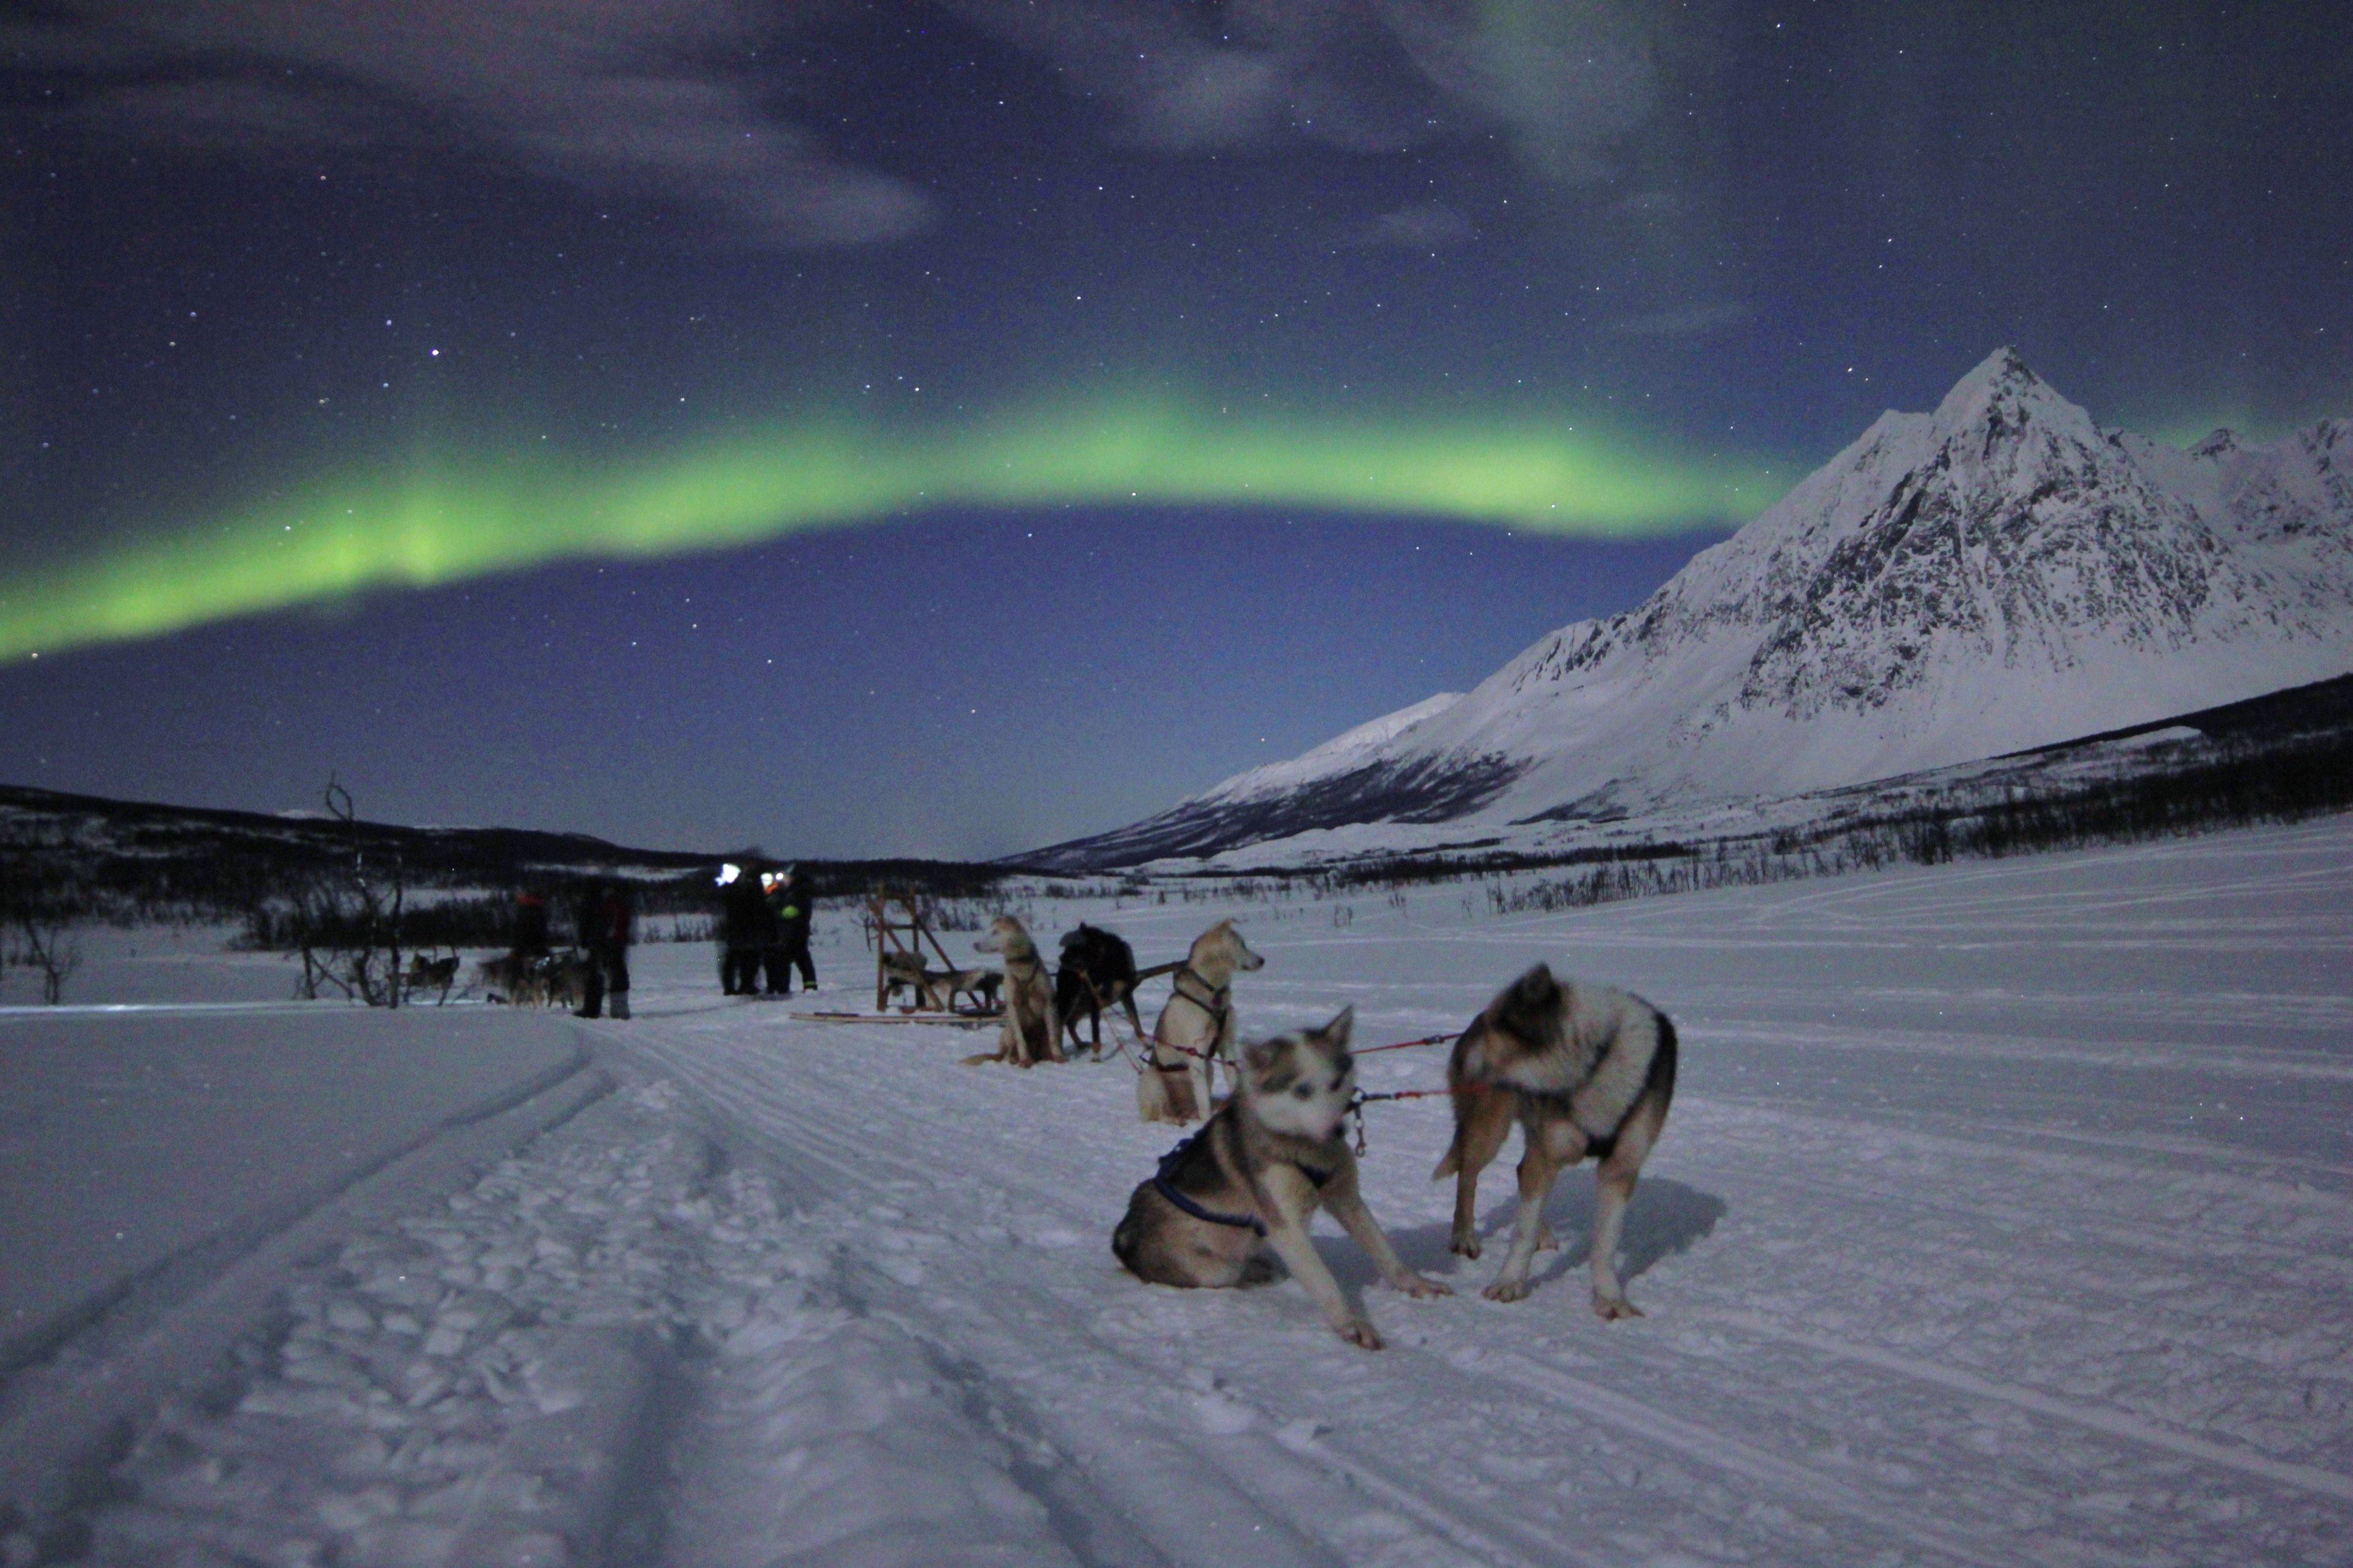 Dog Sledding on the Edge of Tromsø – Evening - Aurora Alps